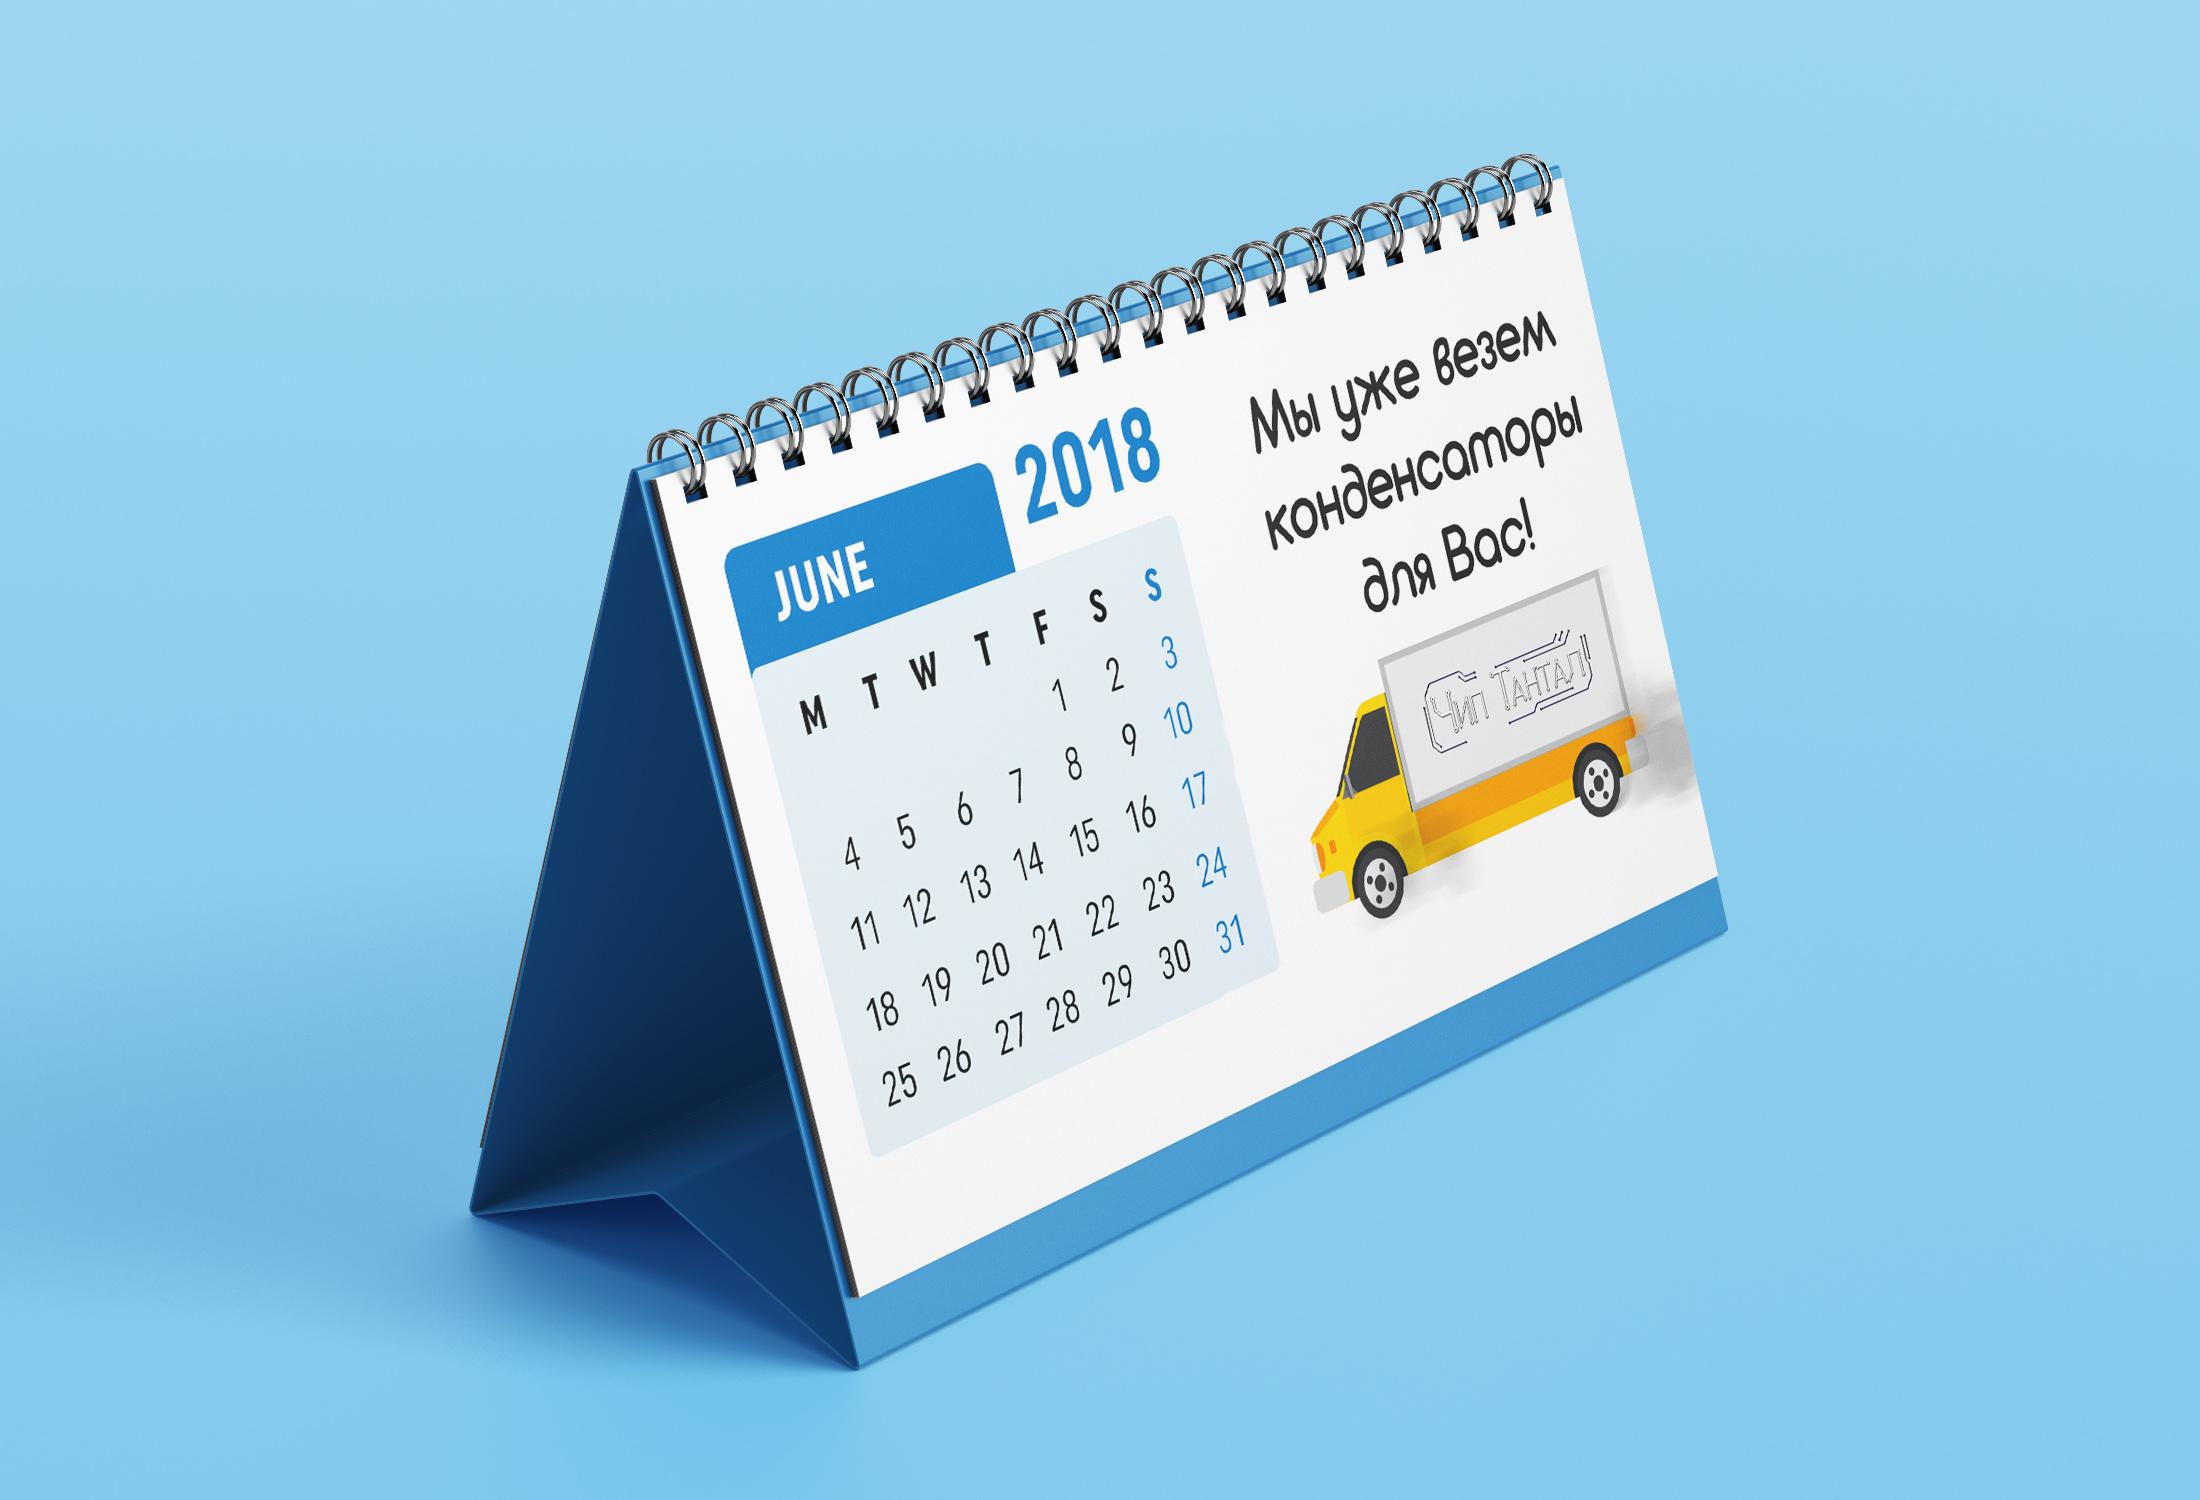 Логотип + Дизайн настольного календаря фото f_5995a245f83d2573.jpg